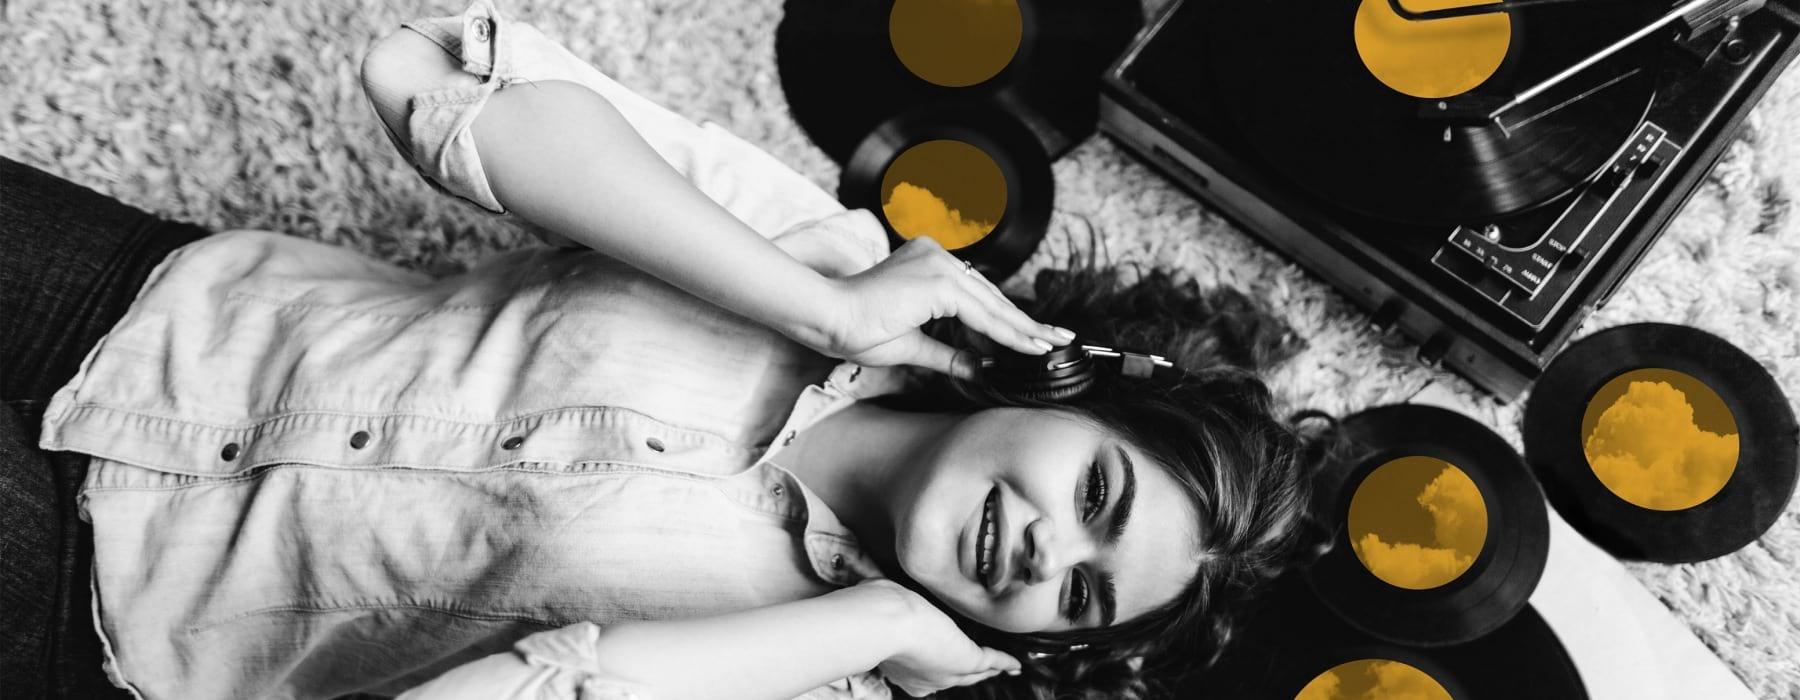 woman listening to records - j sol apartments arlington virginia